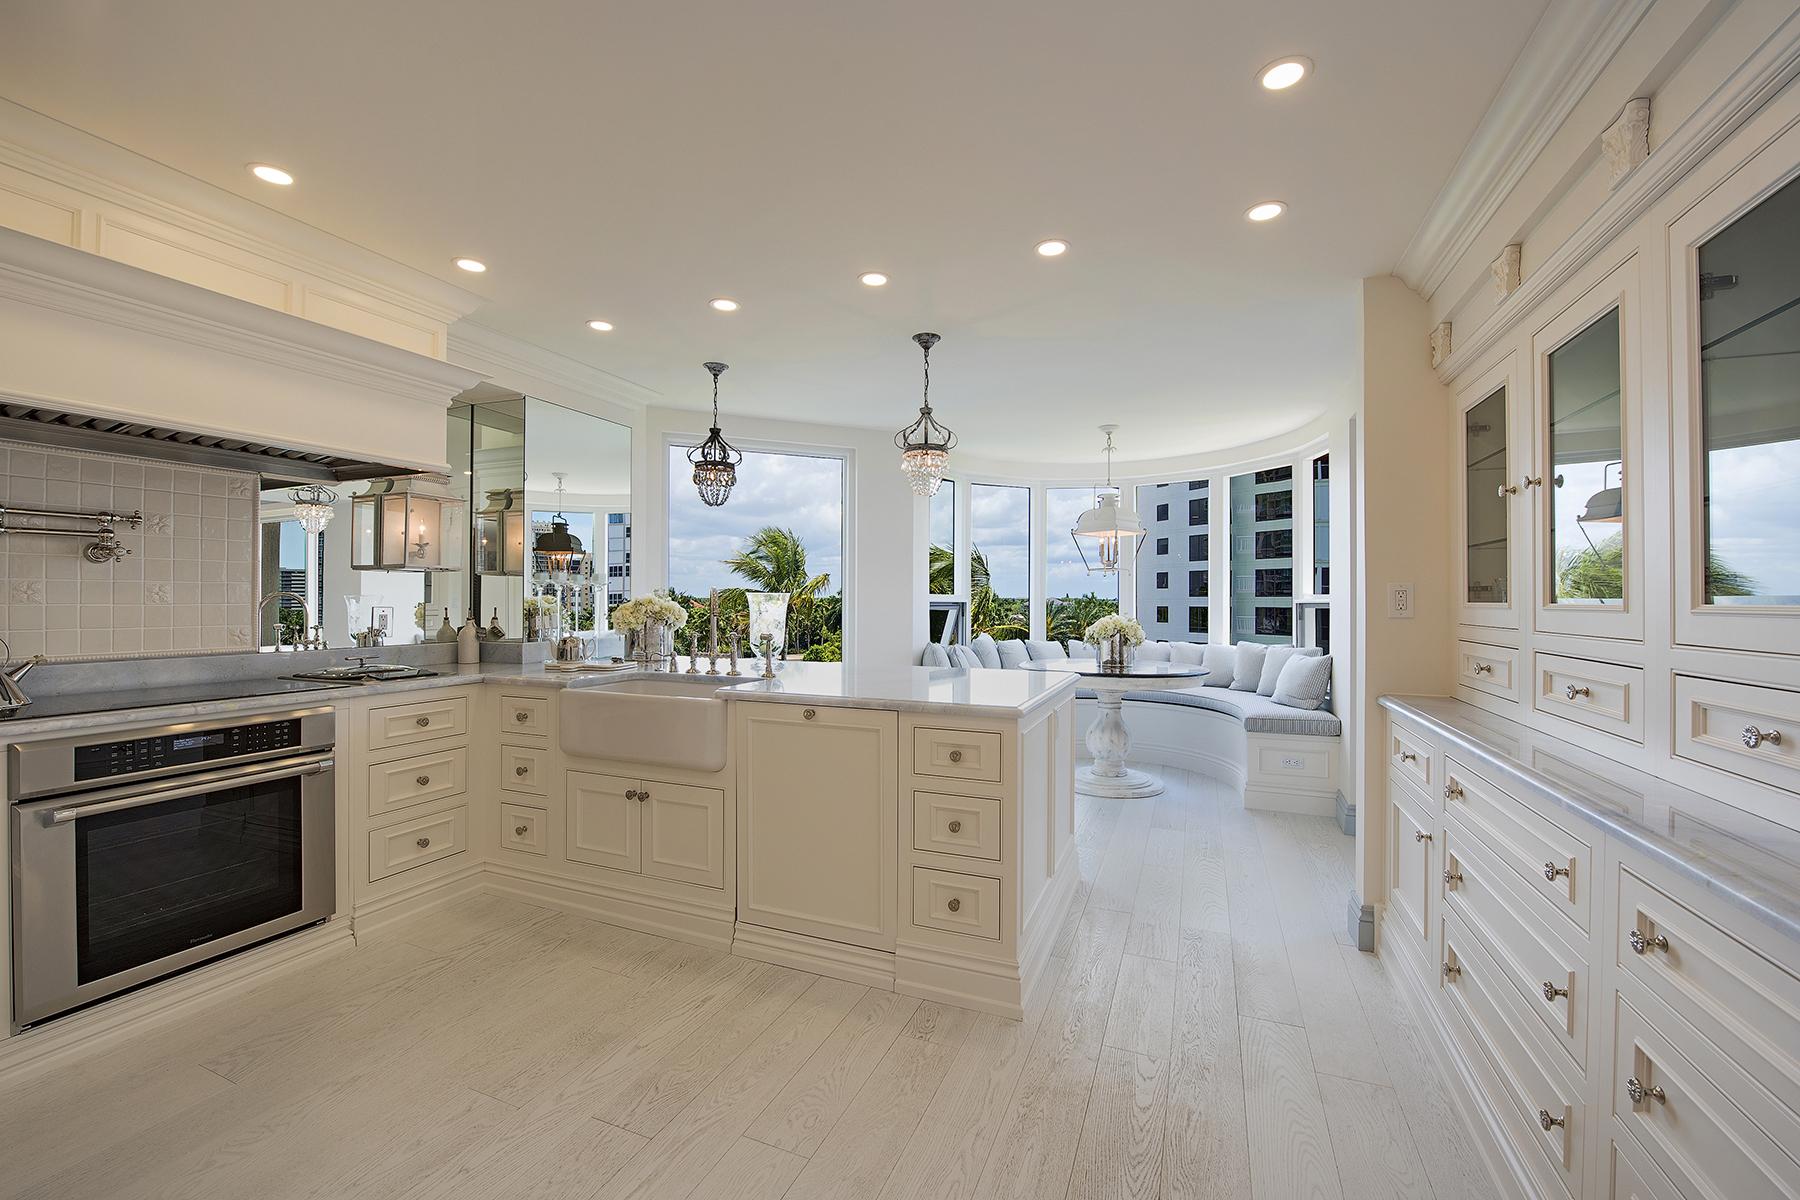 Condominium for Sale at PARK SHORE - PARK SHORE TOWER 4251 Gulf Shore Blvd N 6B Naples, Florida 34103 United States